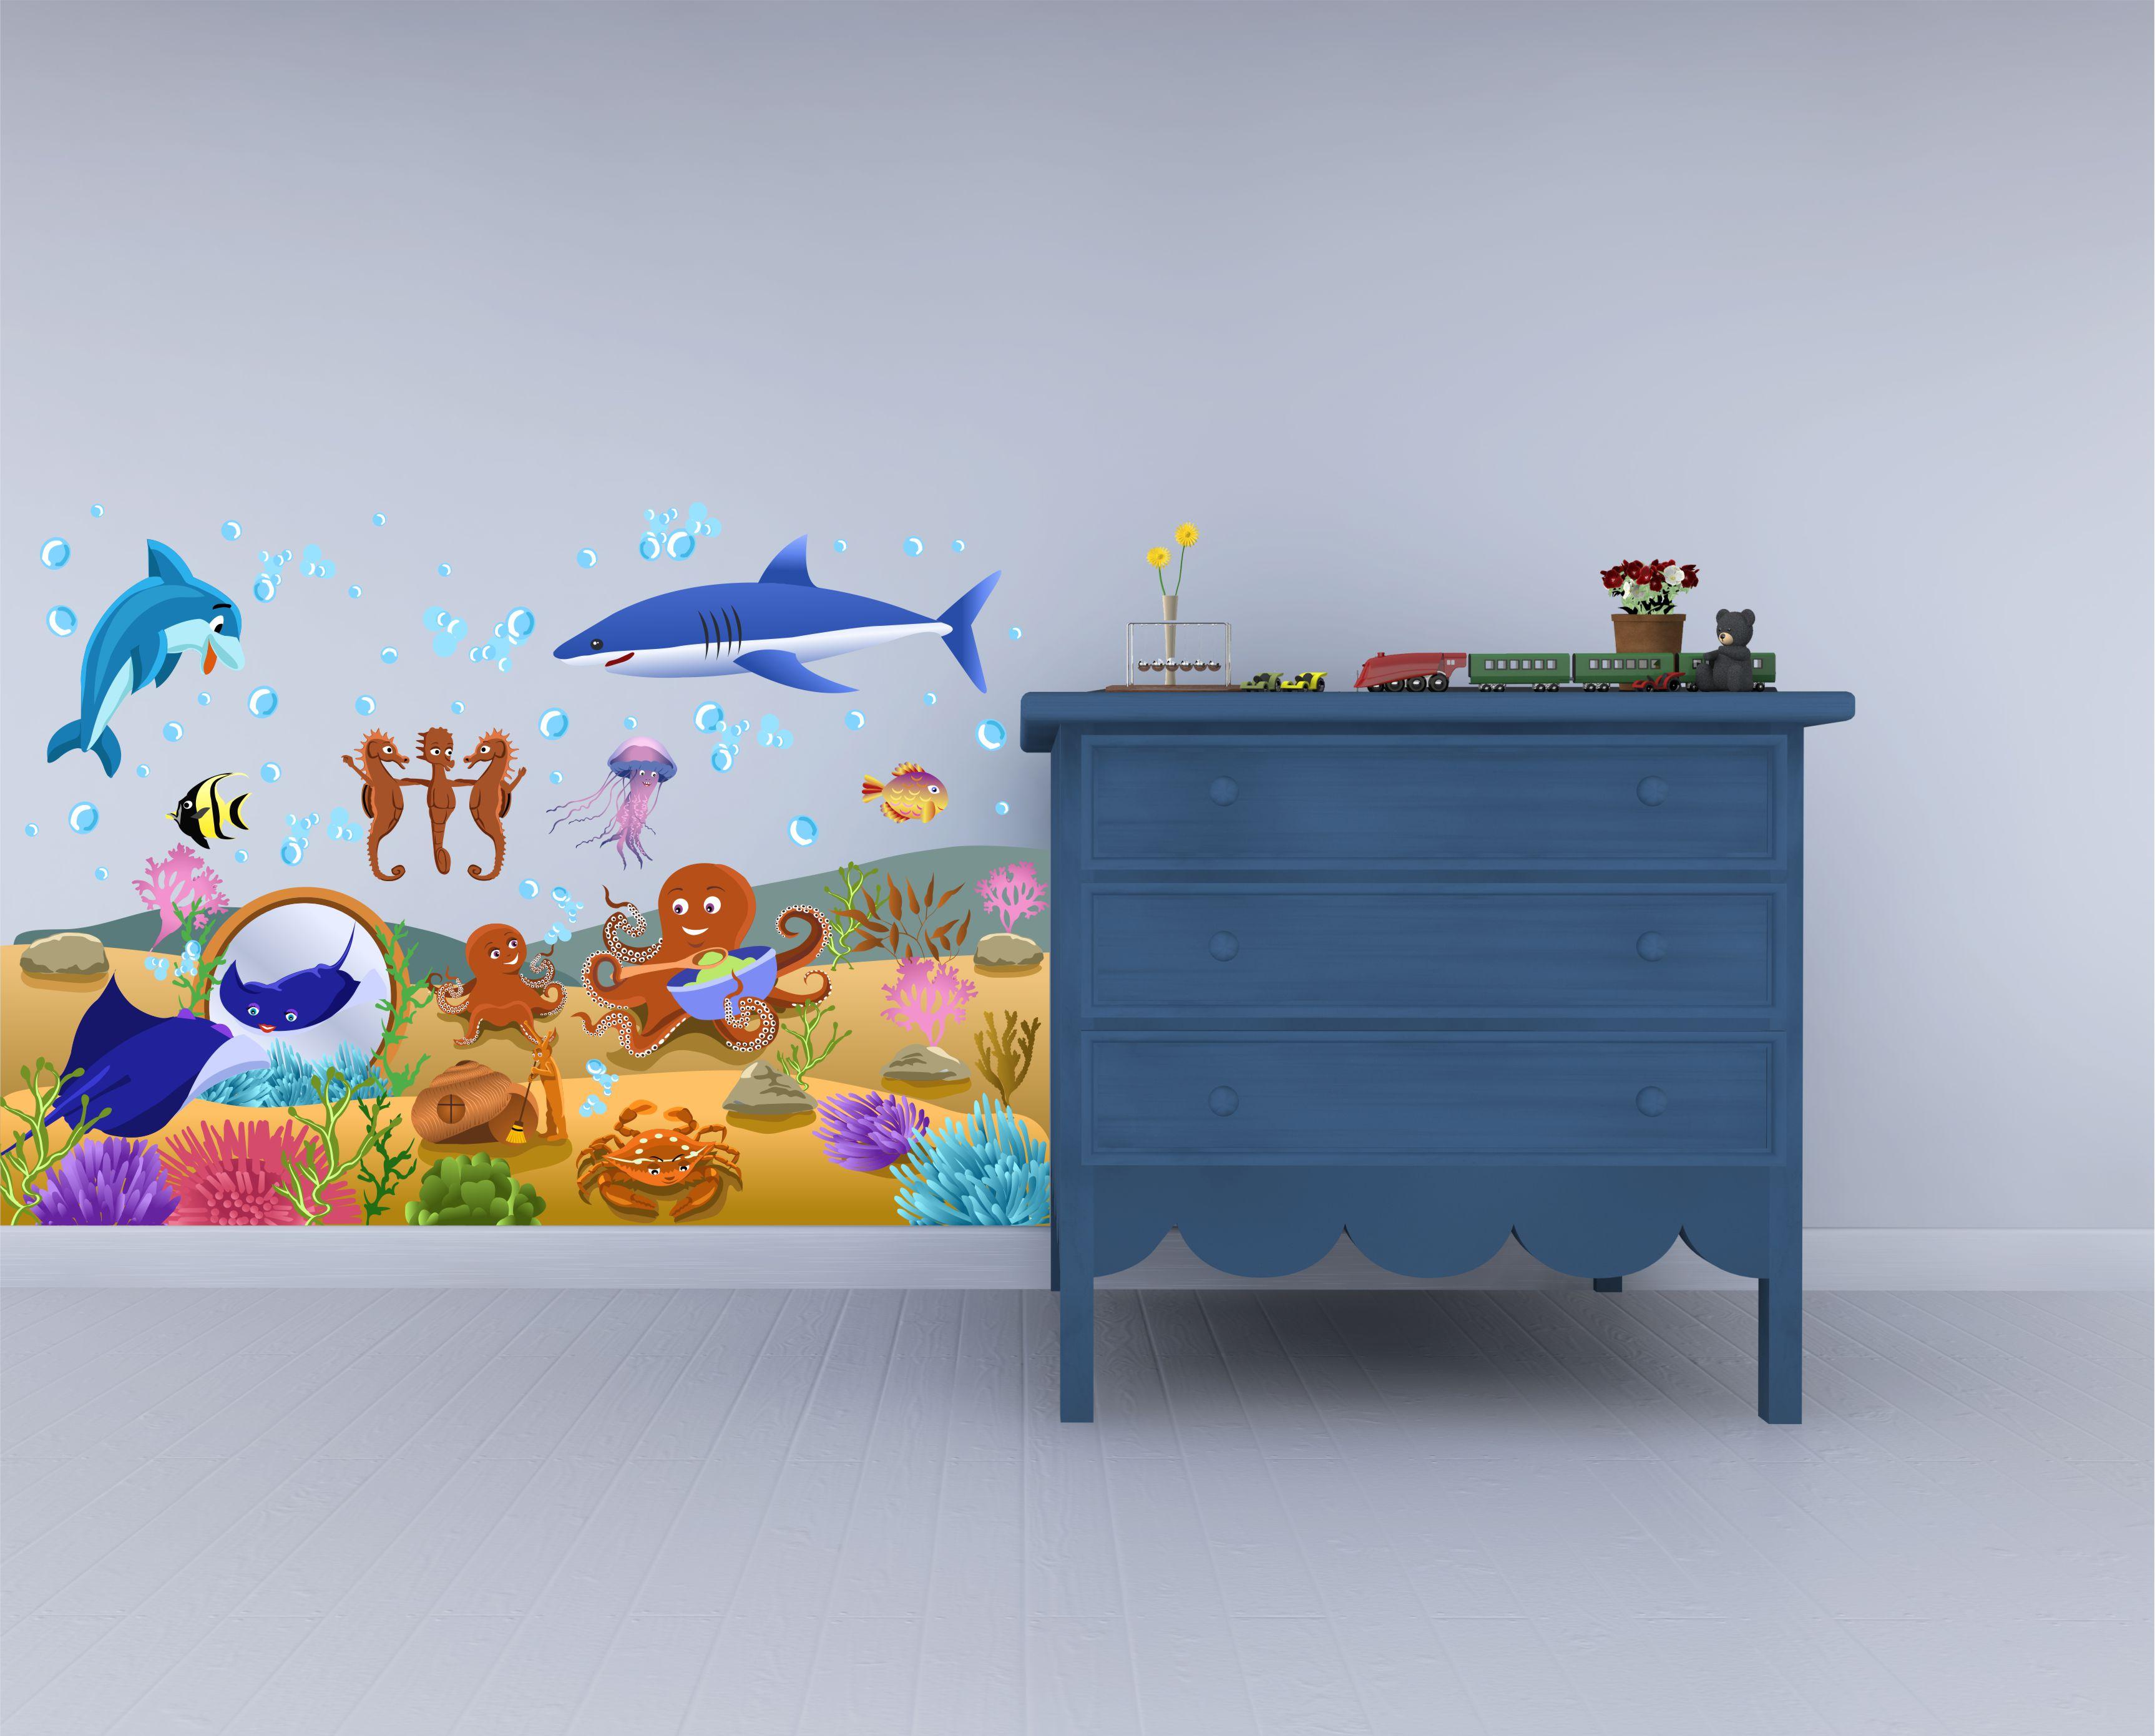 adesivo murale-mondo sommerso